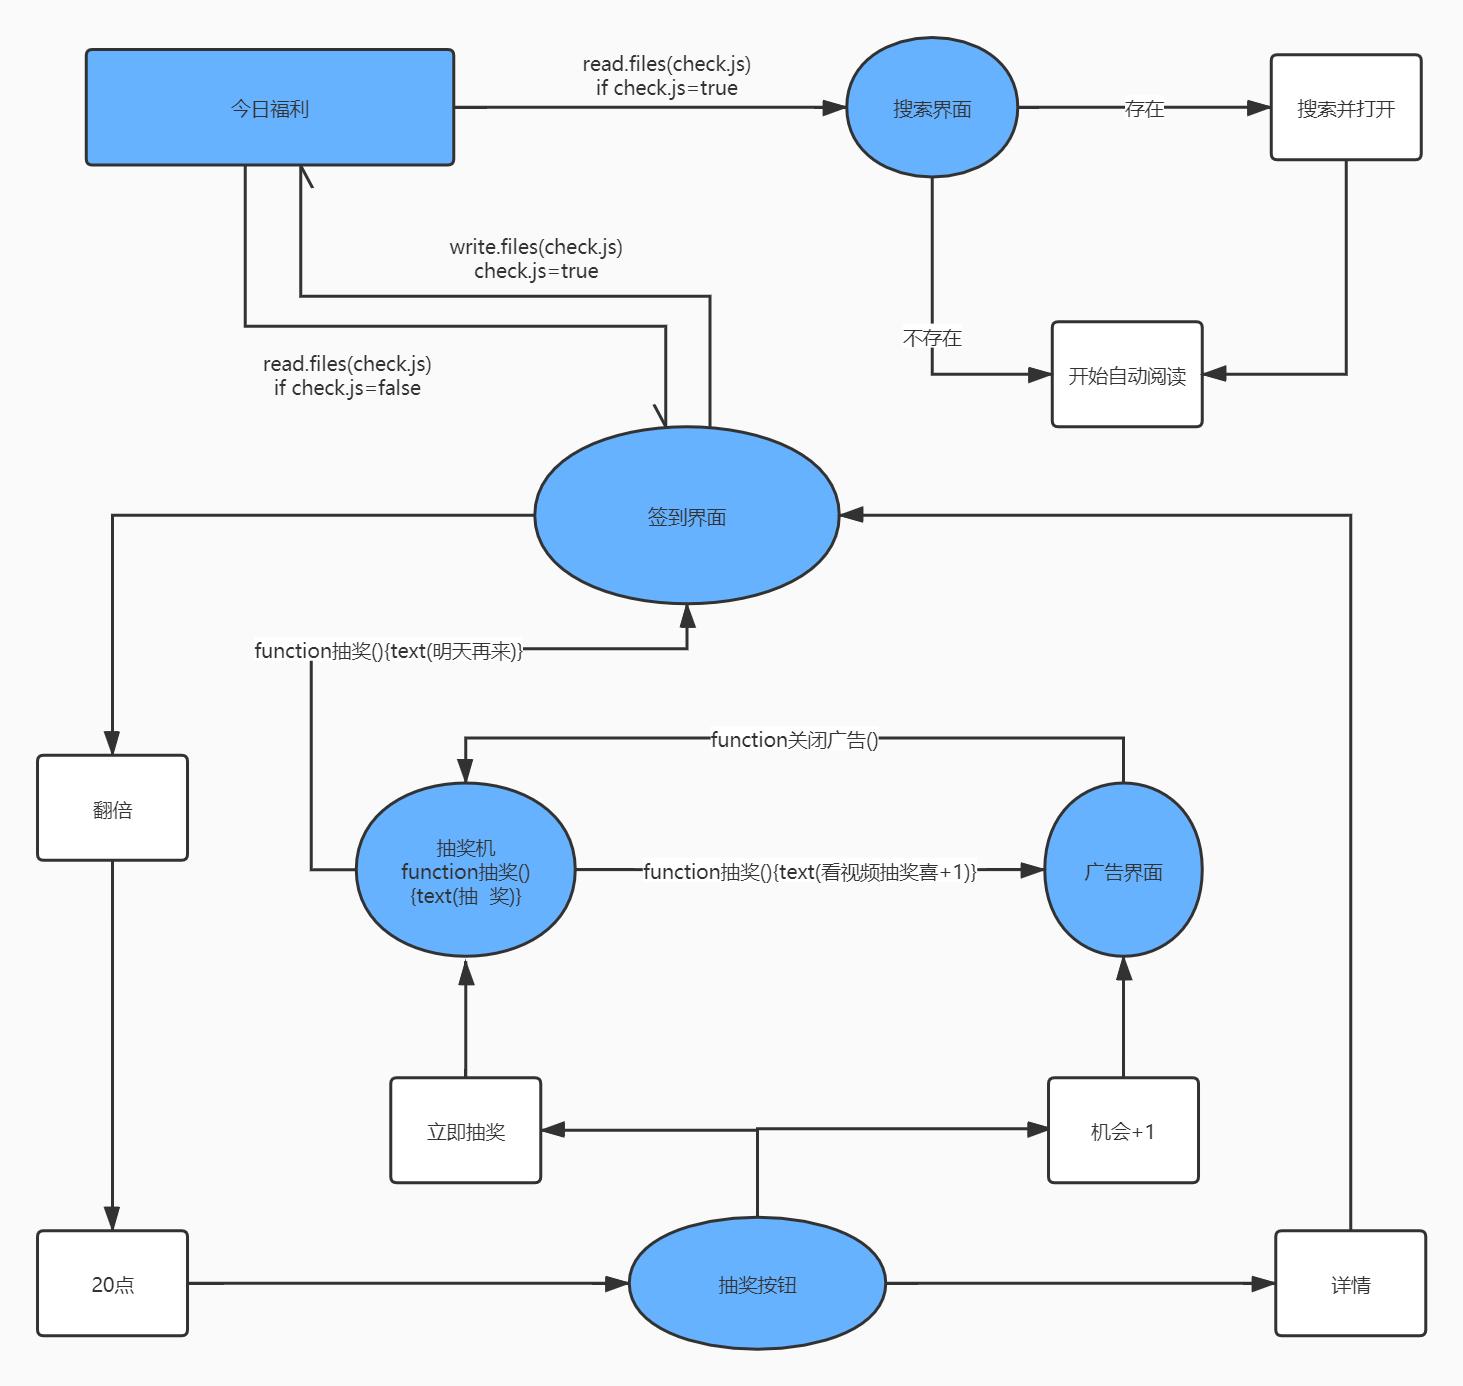 qidian_function_logic.jpg